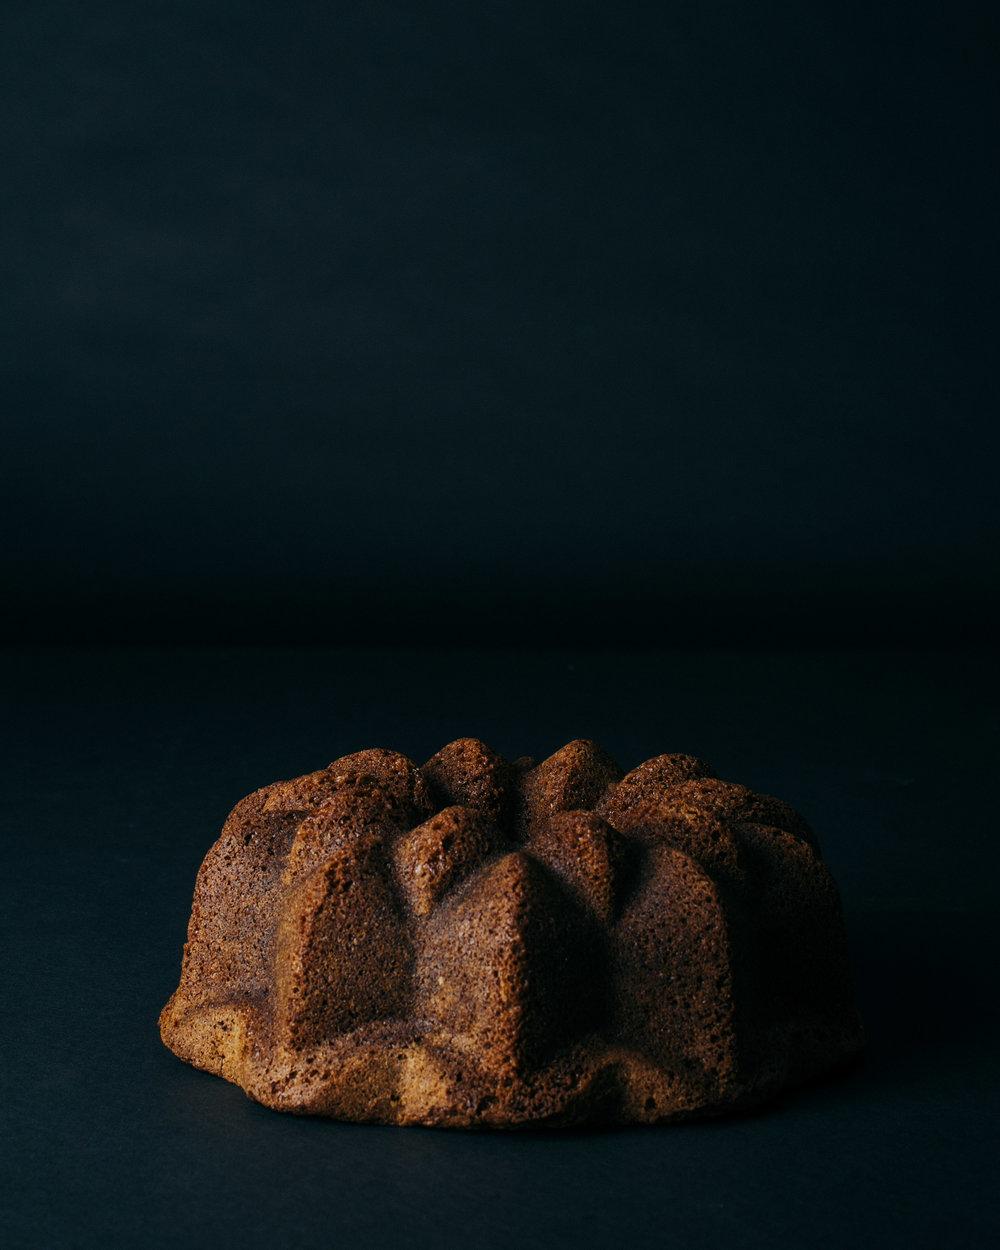 cake-001 copy.jpg